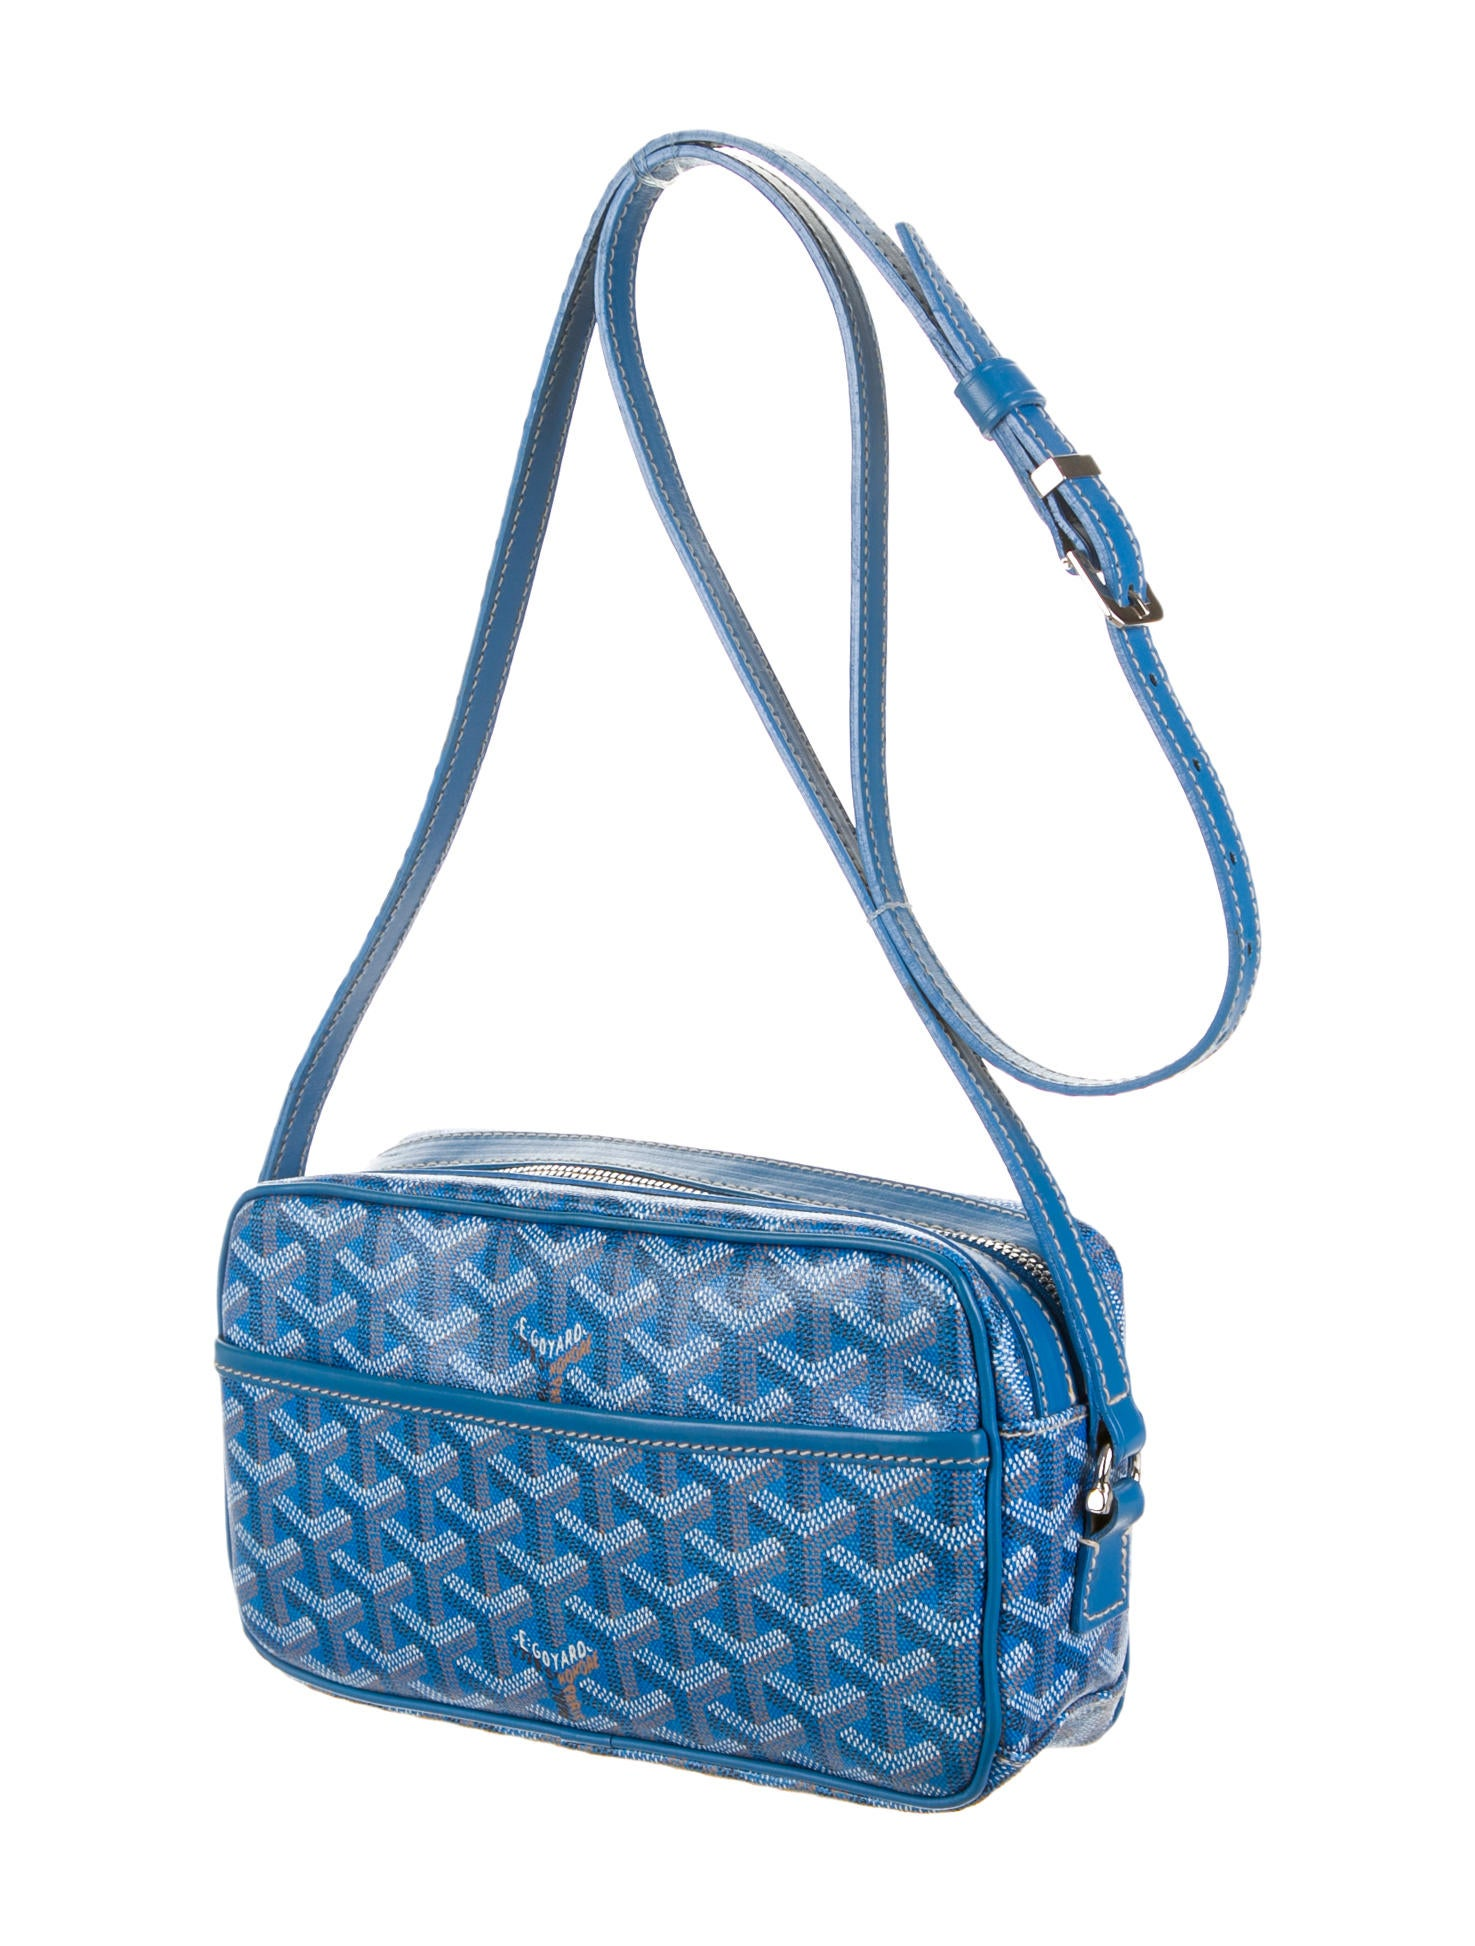 Goyard Amacapvert Crossbody Bag Handbags GOY20352  : GOY203523enlarged from www.therealreal.com size 1475 x 1946 jpeg 254kB